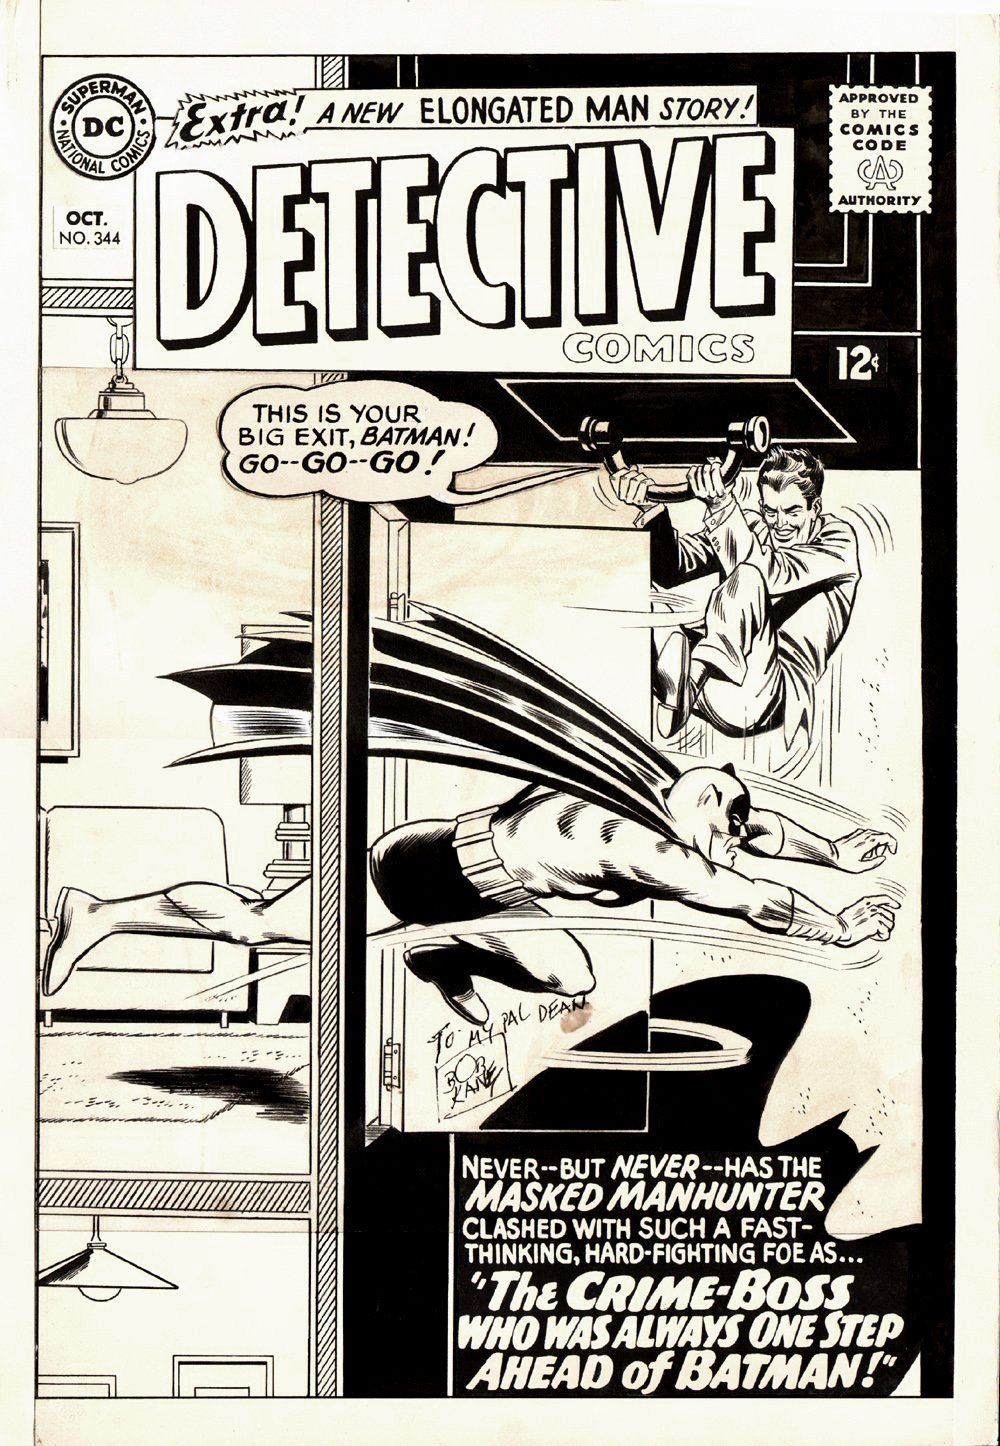 Detective Comics #344 Cover (Large Art) 1965